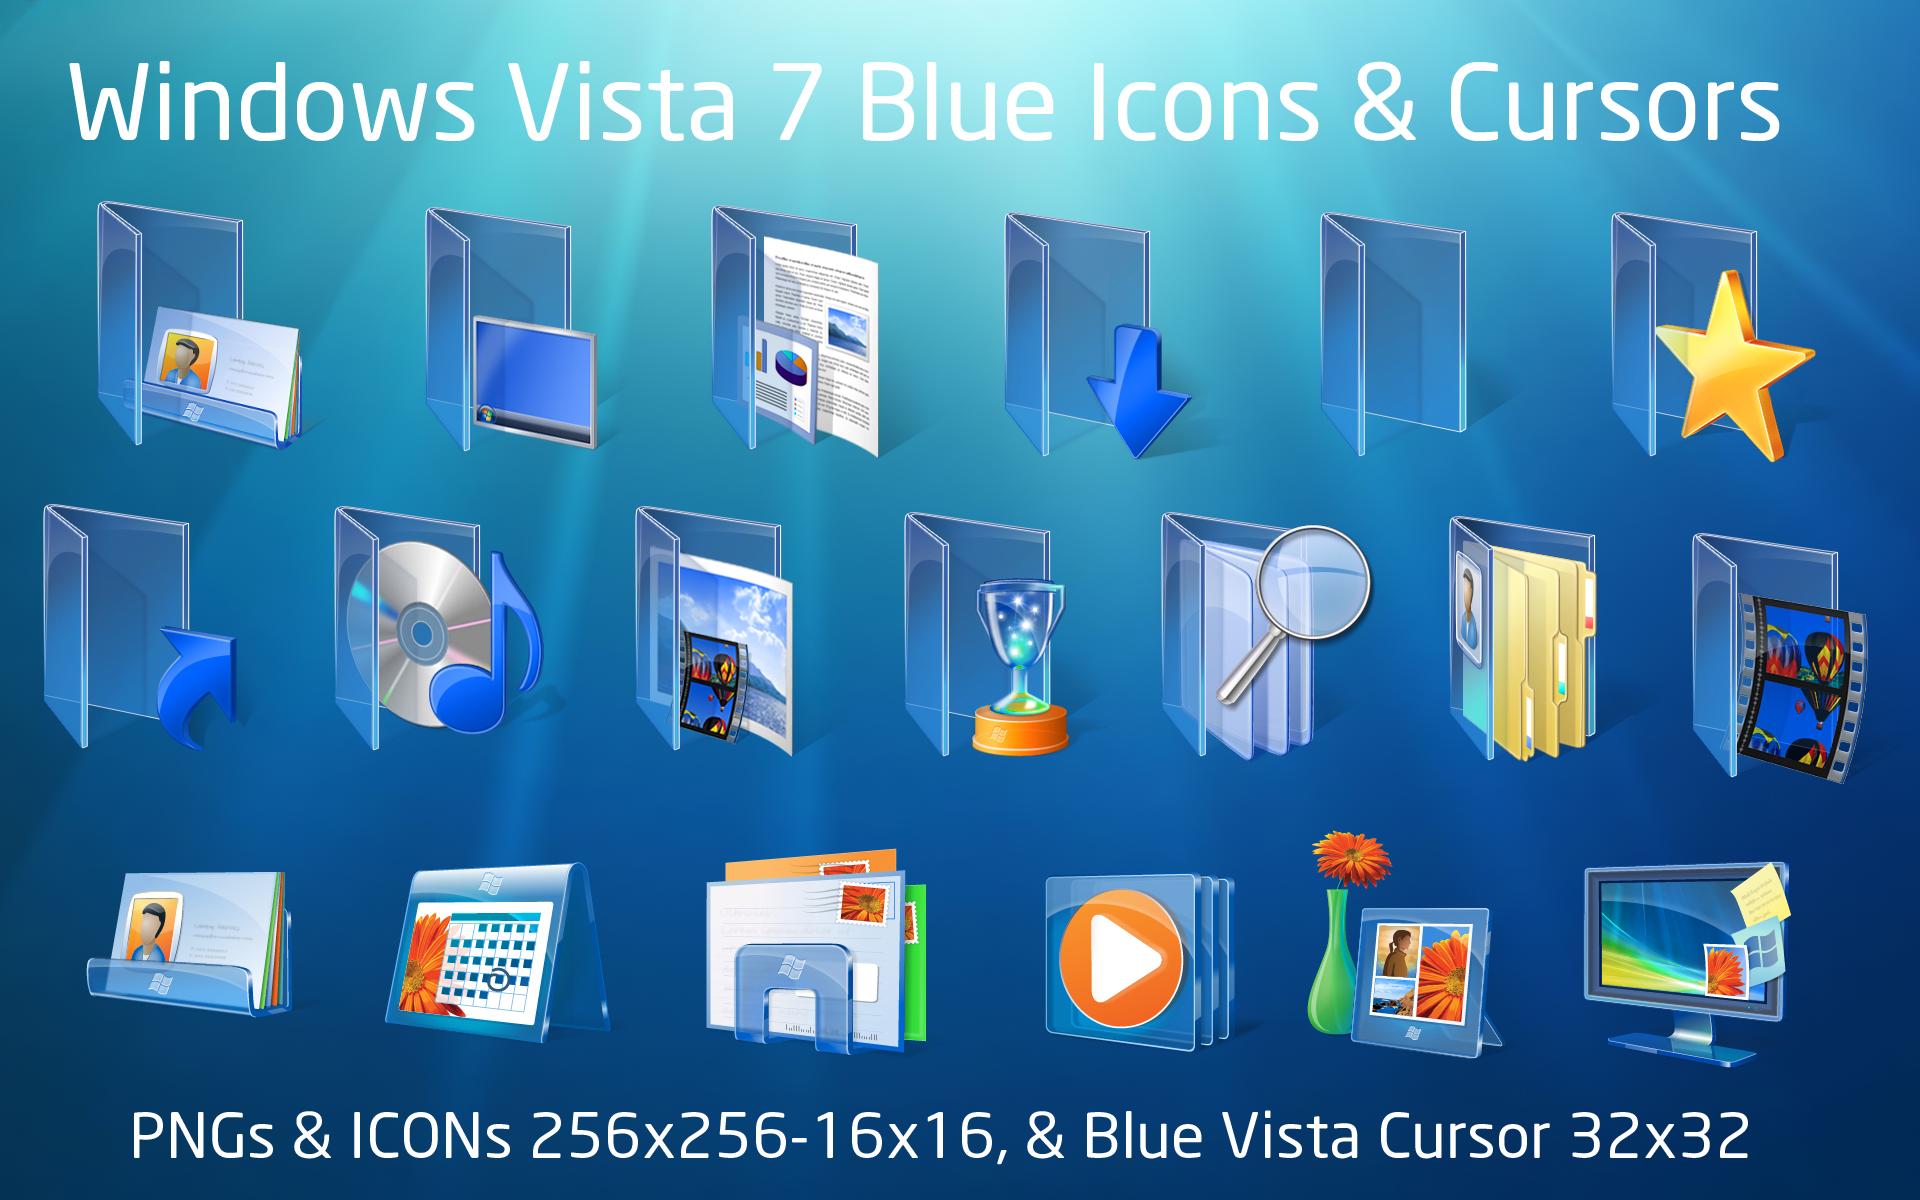 8 Windows Vista Icon Pack Images